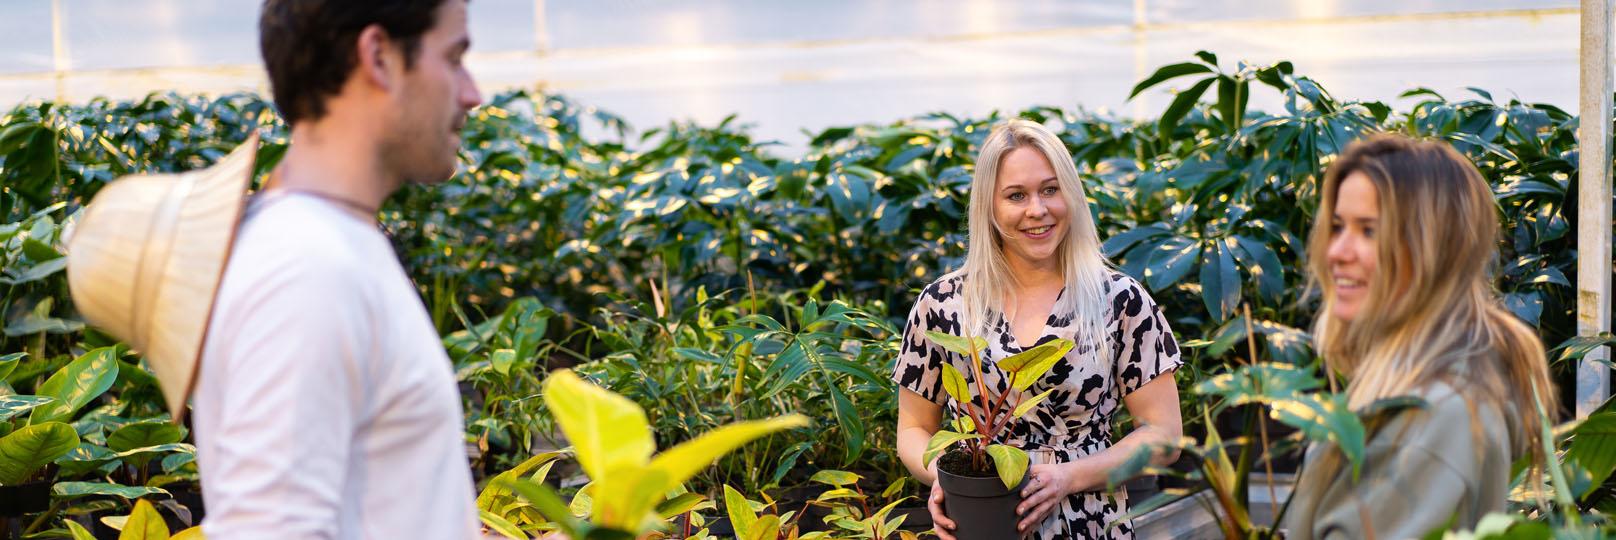 Koen Merel Rosa pratend in kwekerij